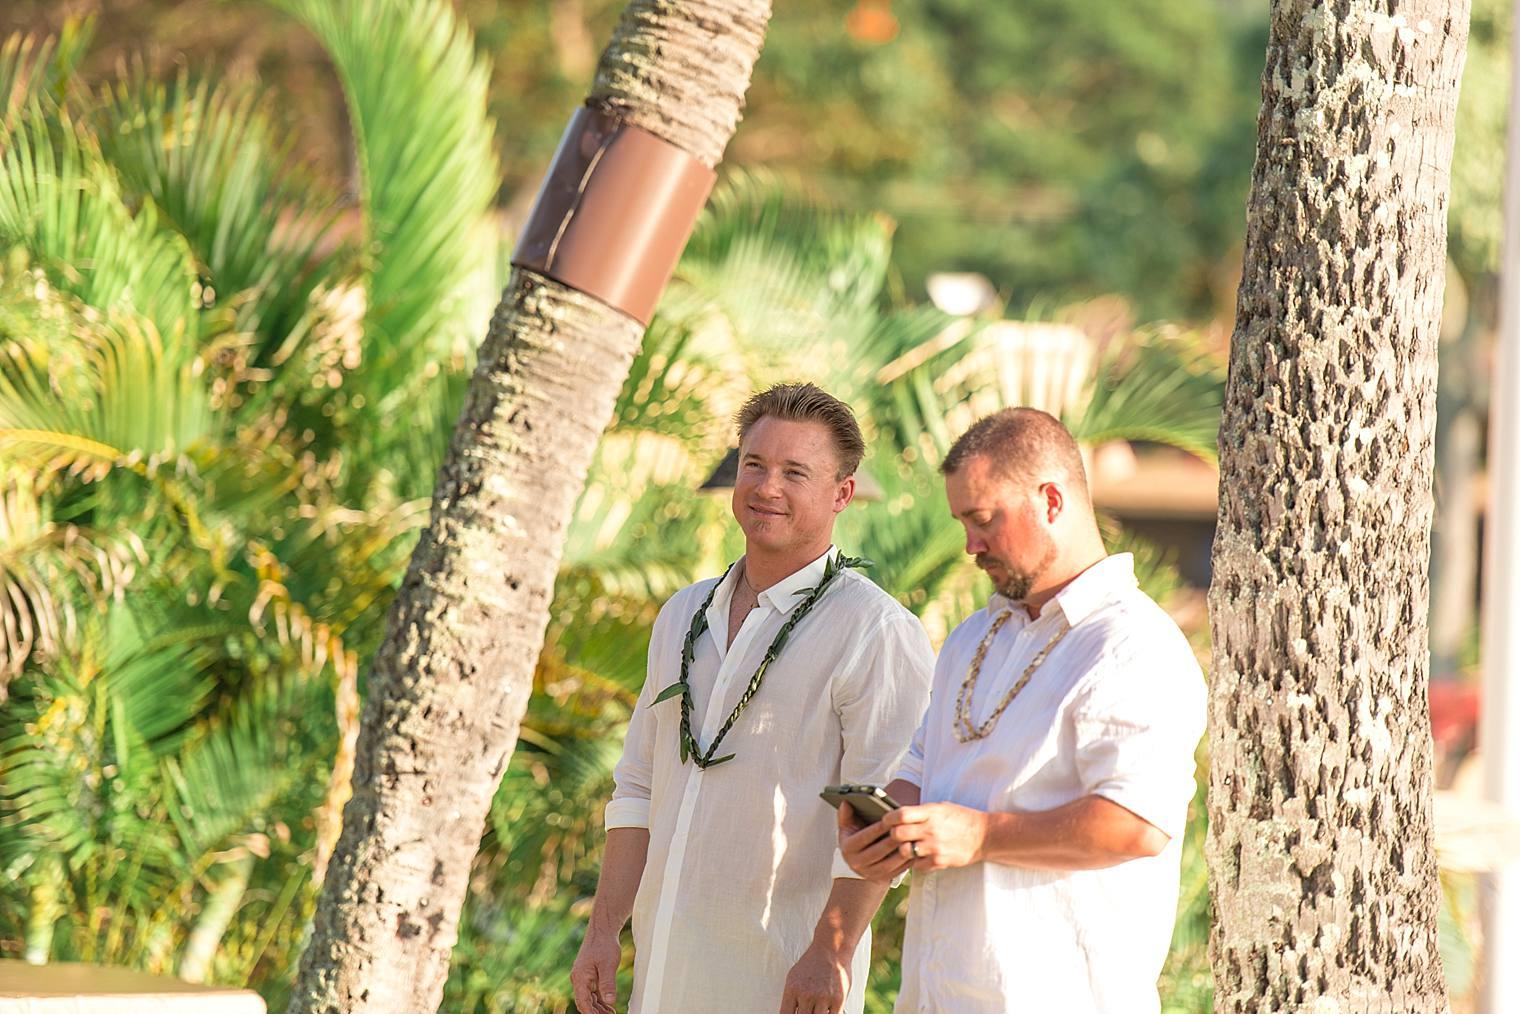 Destination Wedding at Sea House Napili - Maui Wedding Photographer_0016